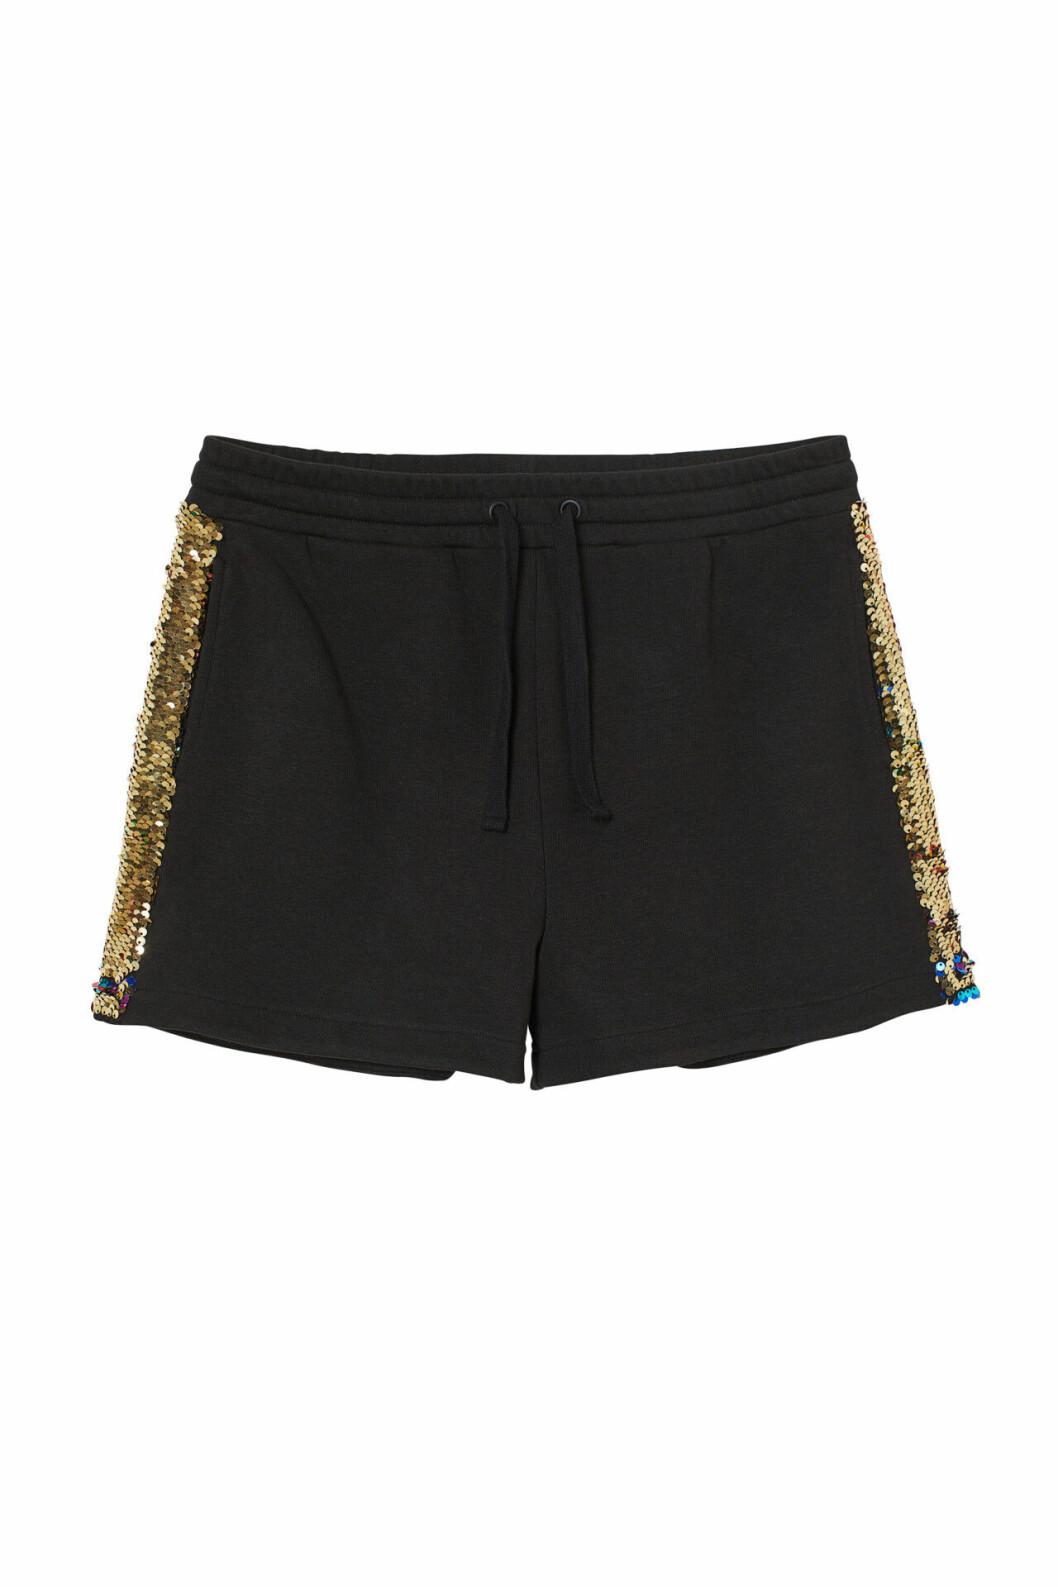 H&M:s pridekollektion 2019 – svarta shorts med paljetter